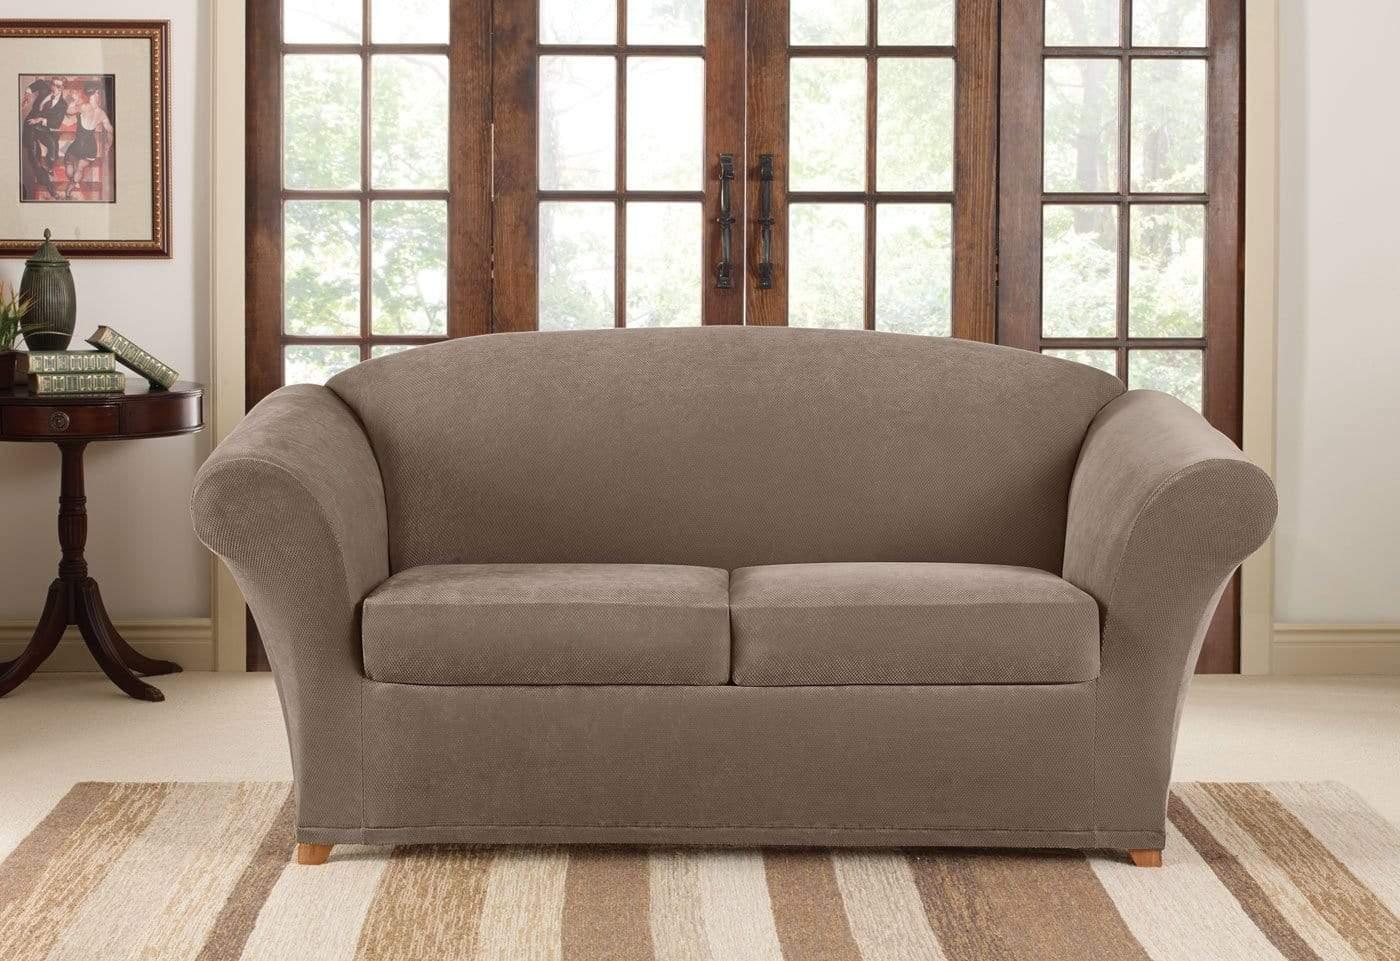 durham one piece sofa slipcover leather bed argos stretch pique three loveseat surefit